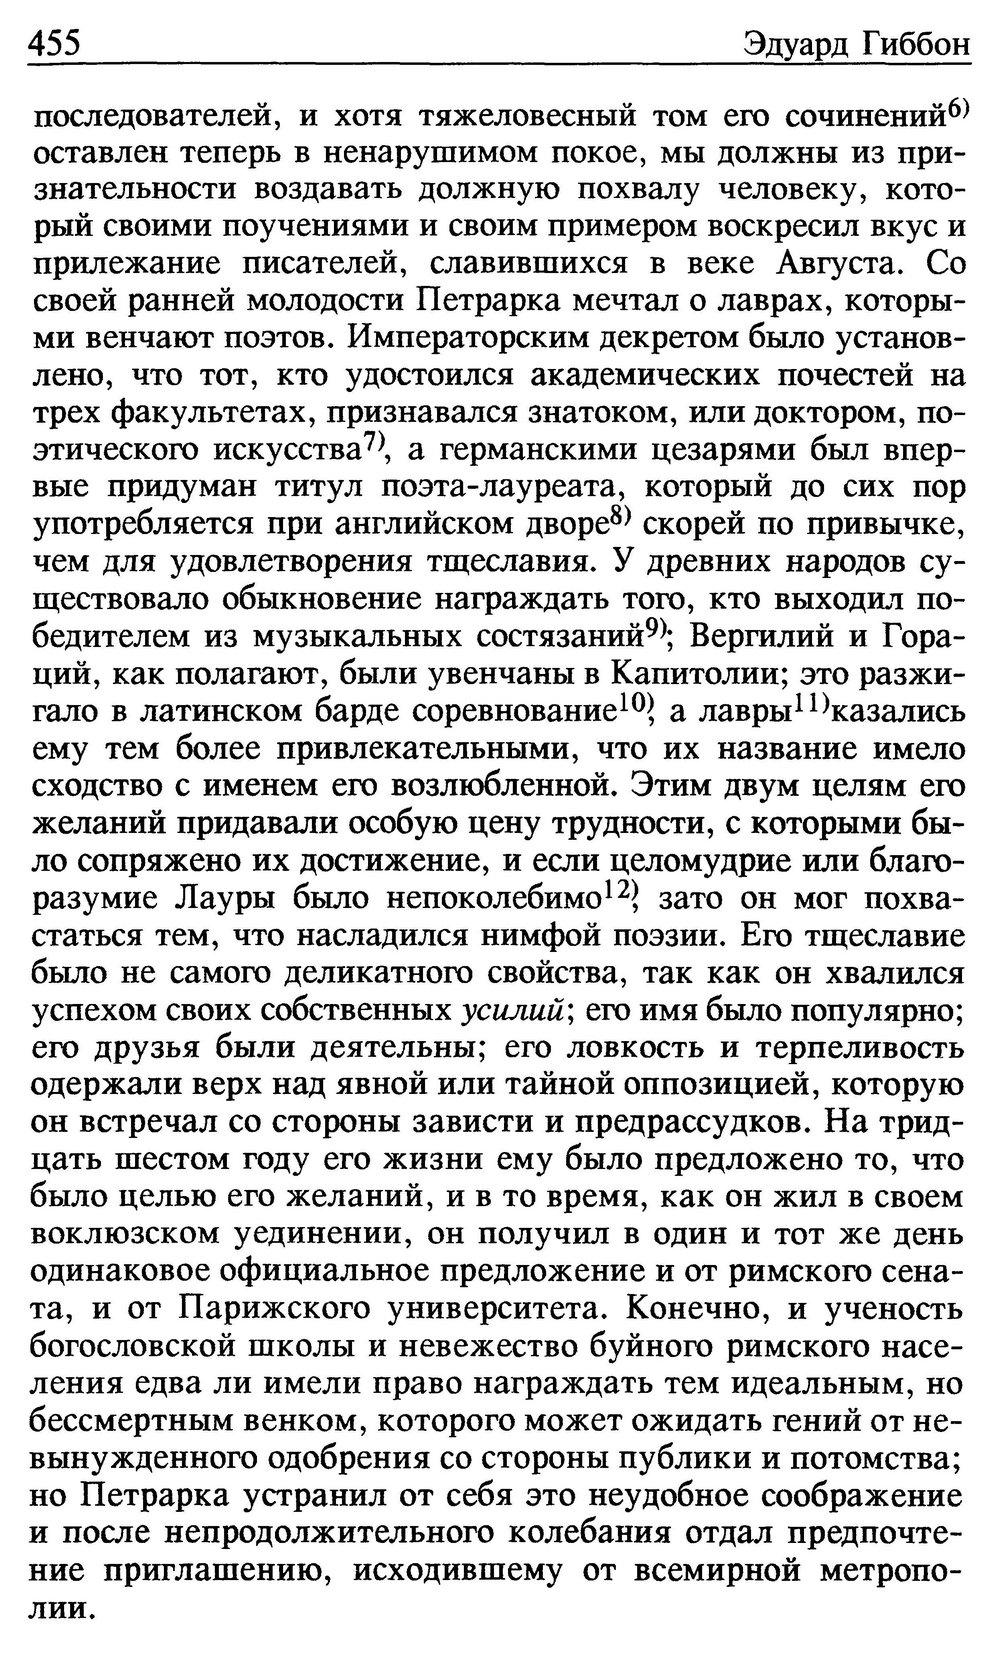 http://images.vfl.ru/ii/1367417386/4e29fa8d/2258642.jpg